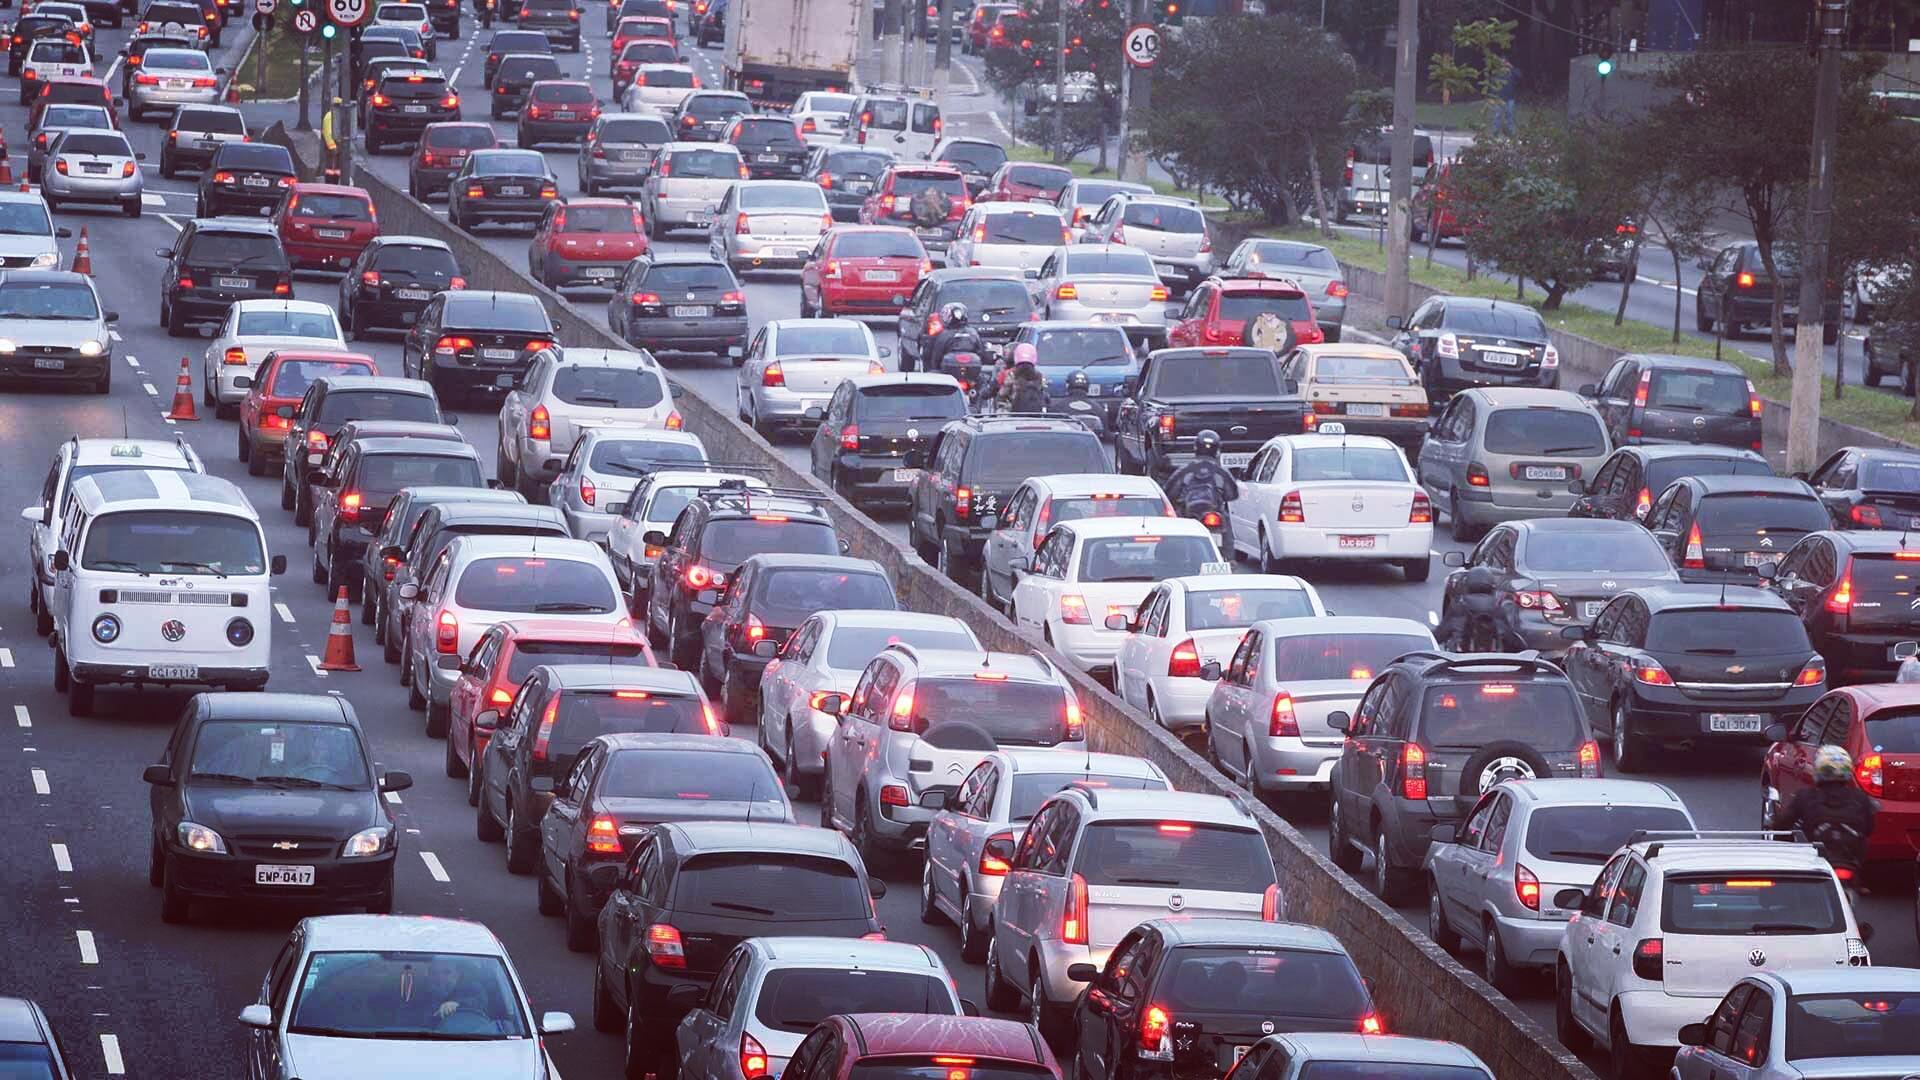 حلول ازدحام المرور